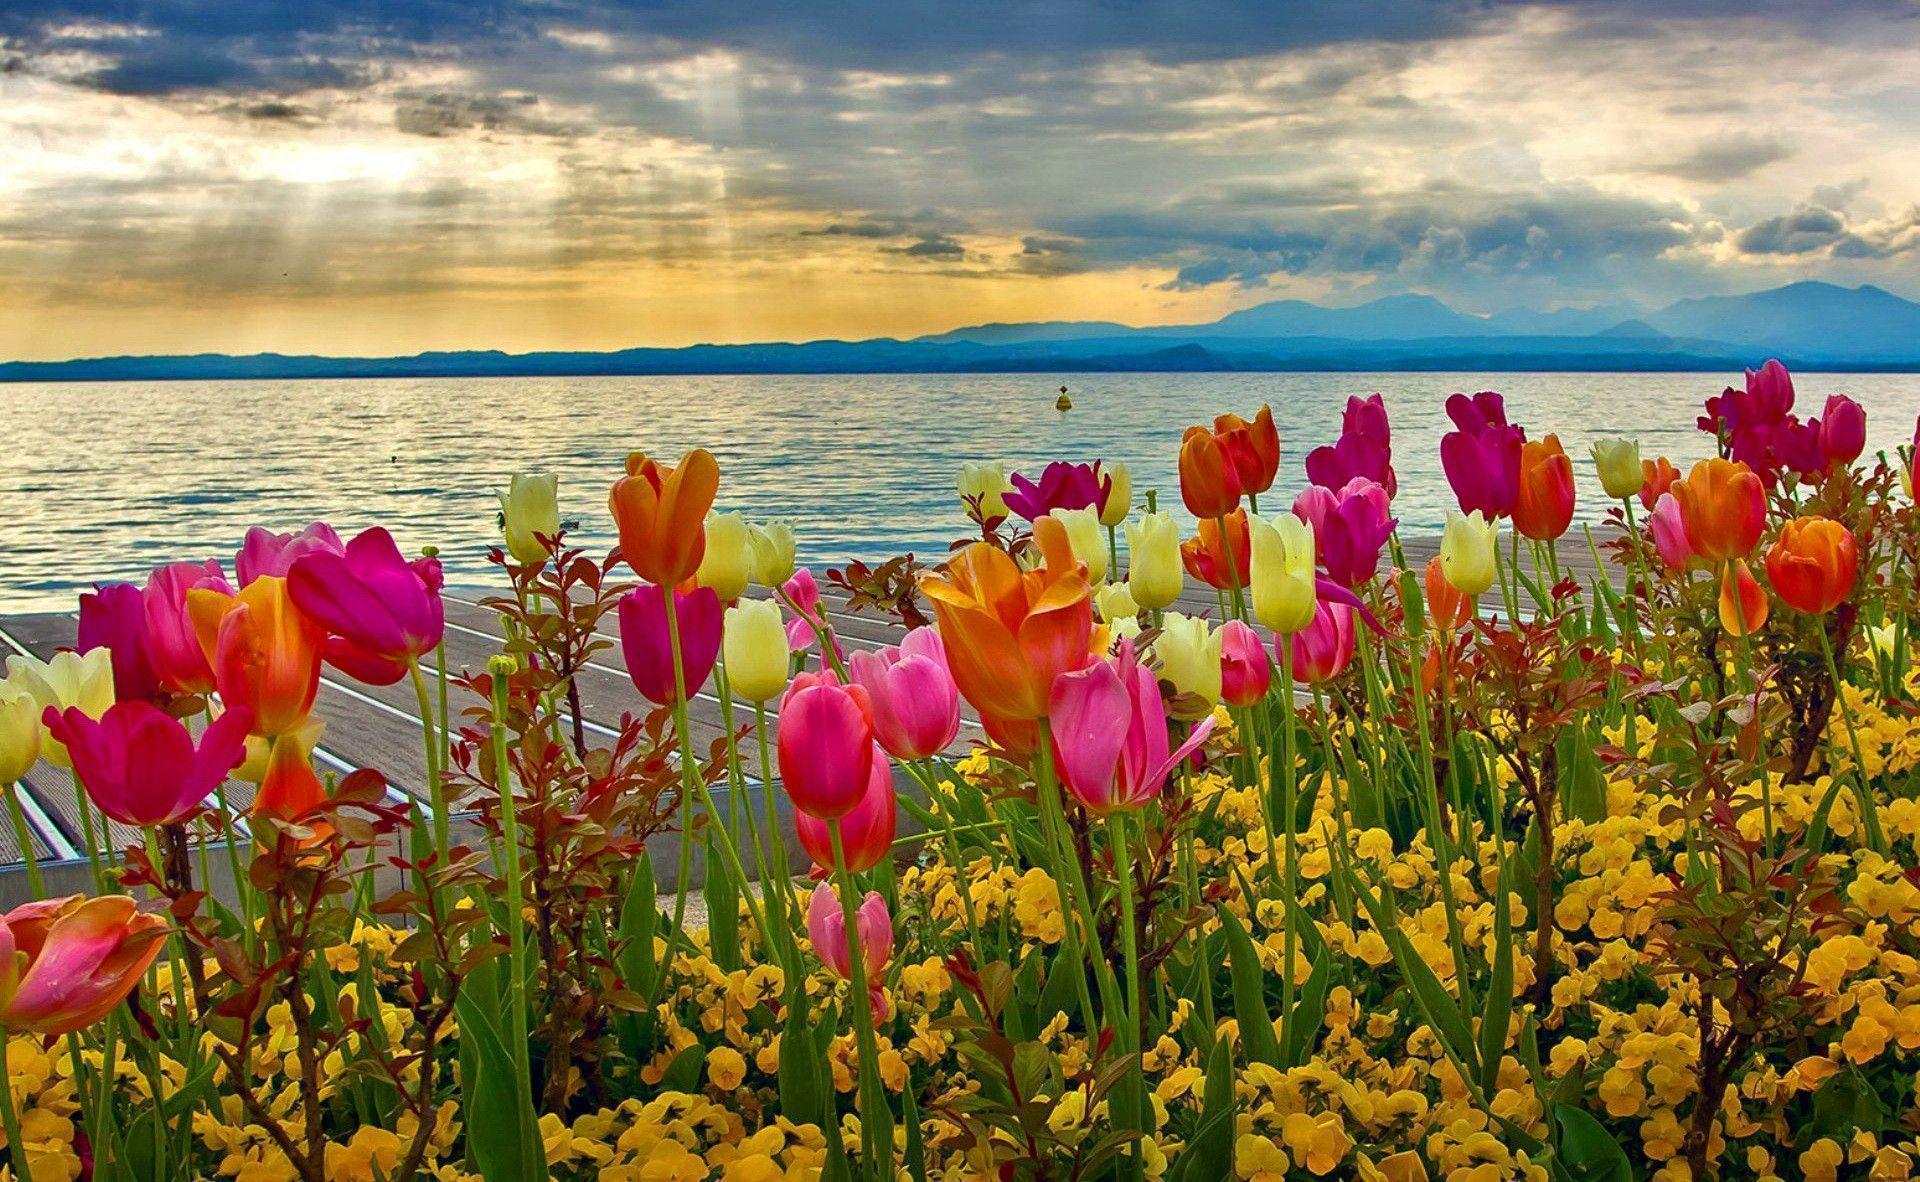 Download Beautiful Spring Season Wallpapers for Desktop | Wallpapers